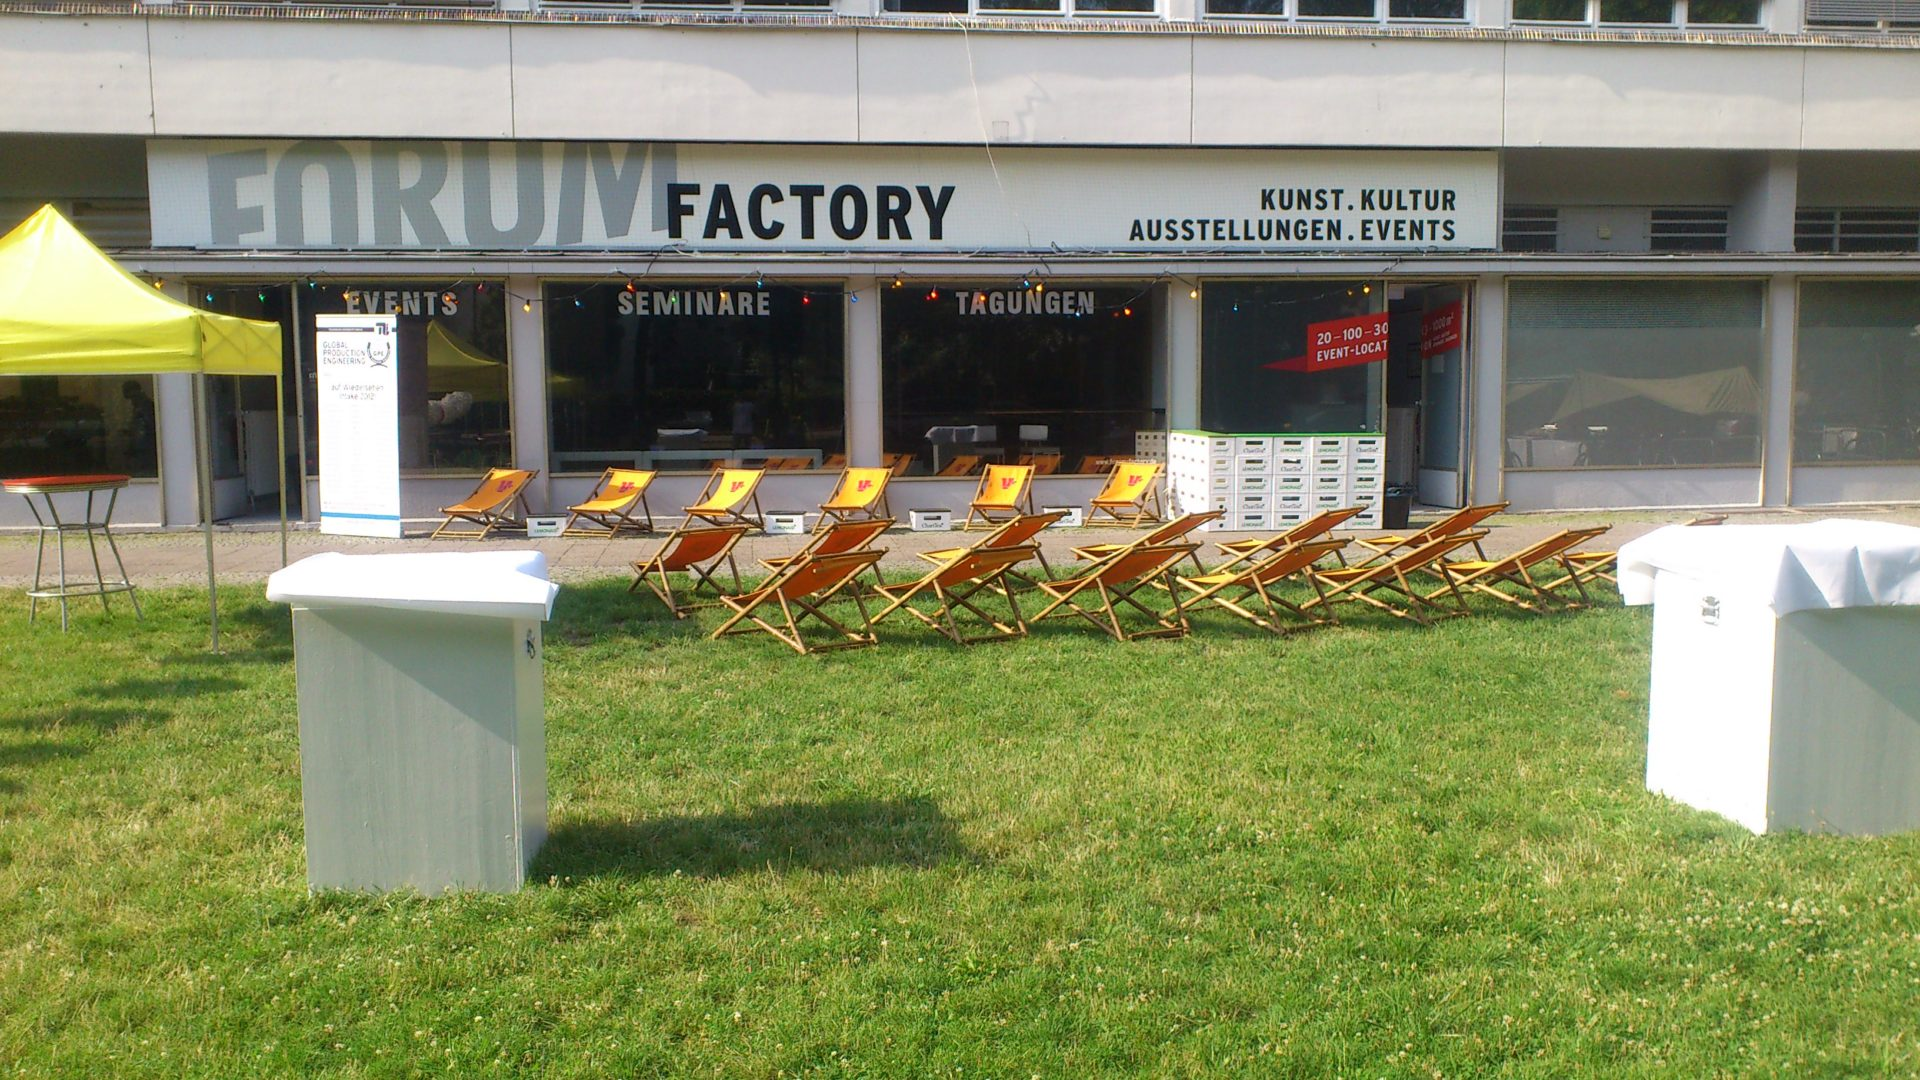 10969-forum-factory